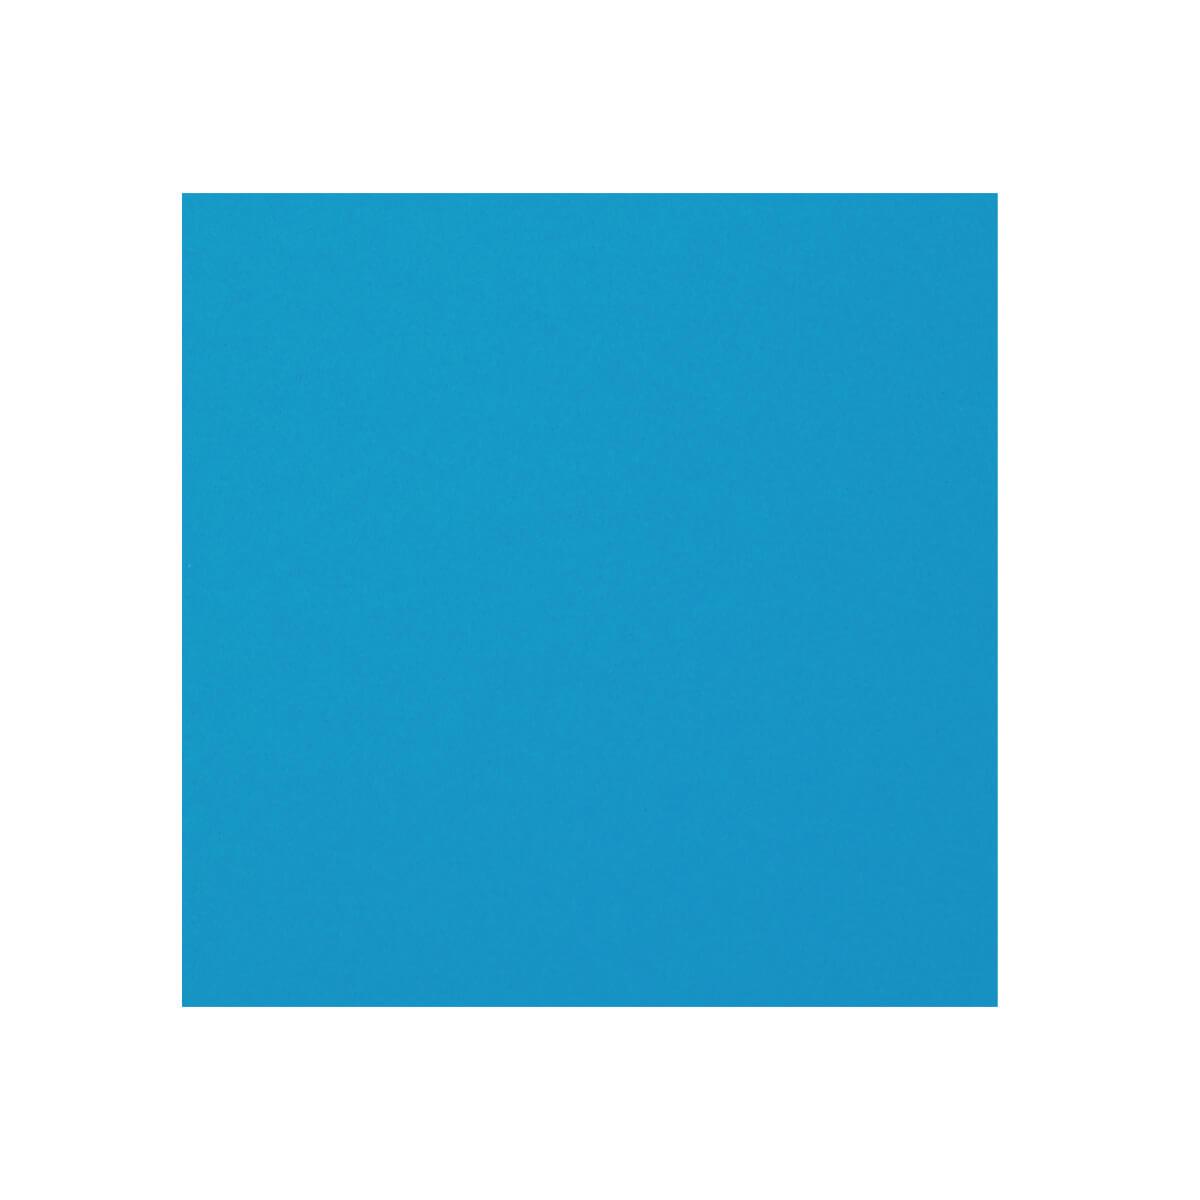 BRIGHT BLUE 220mm SQUARE PEEL & SEAL ENVELOPES